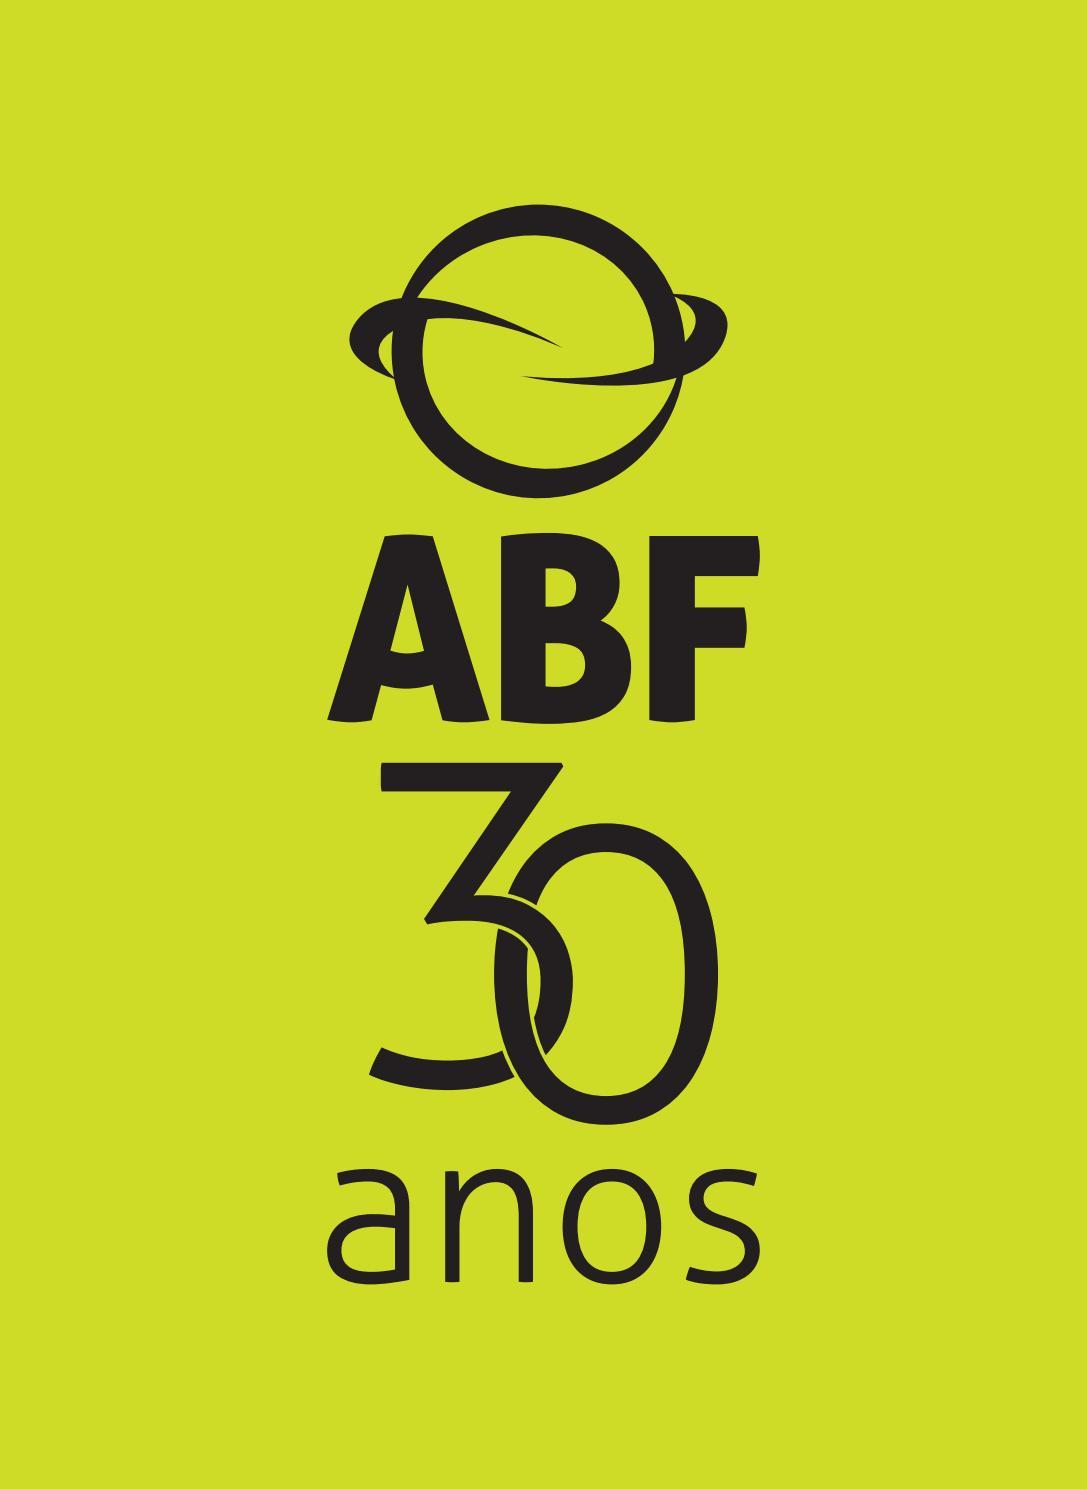 Livro ABF 30 anos by Editora Lamonica Conectada - issuu 22bde7b51a